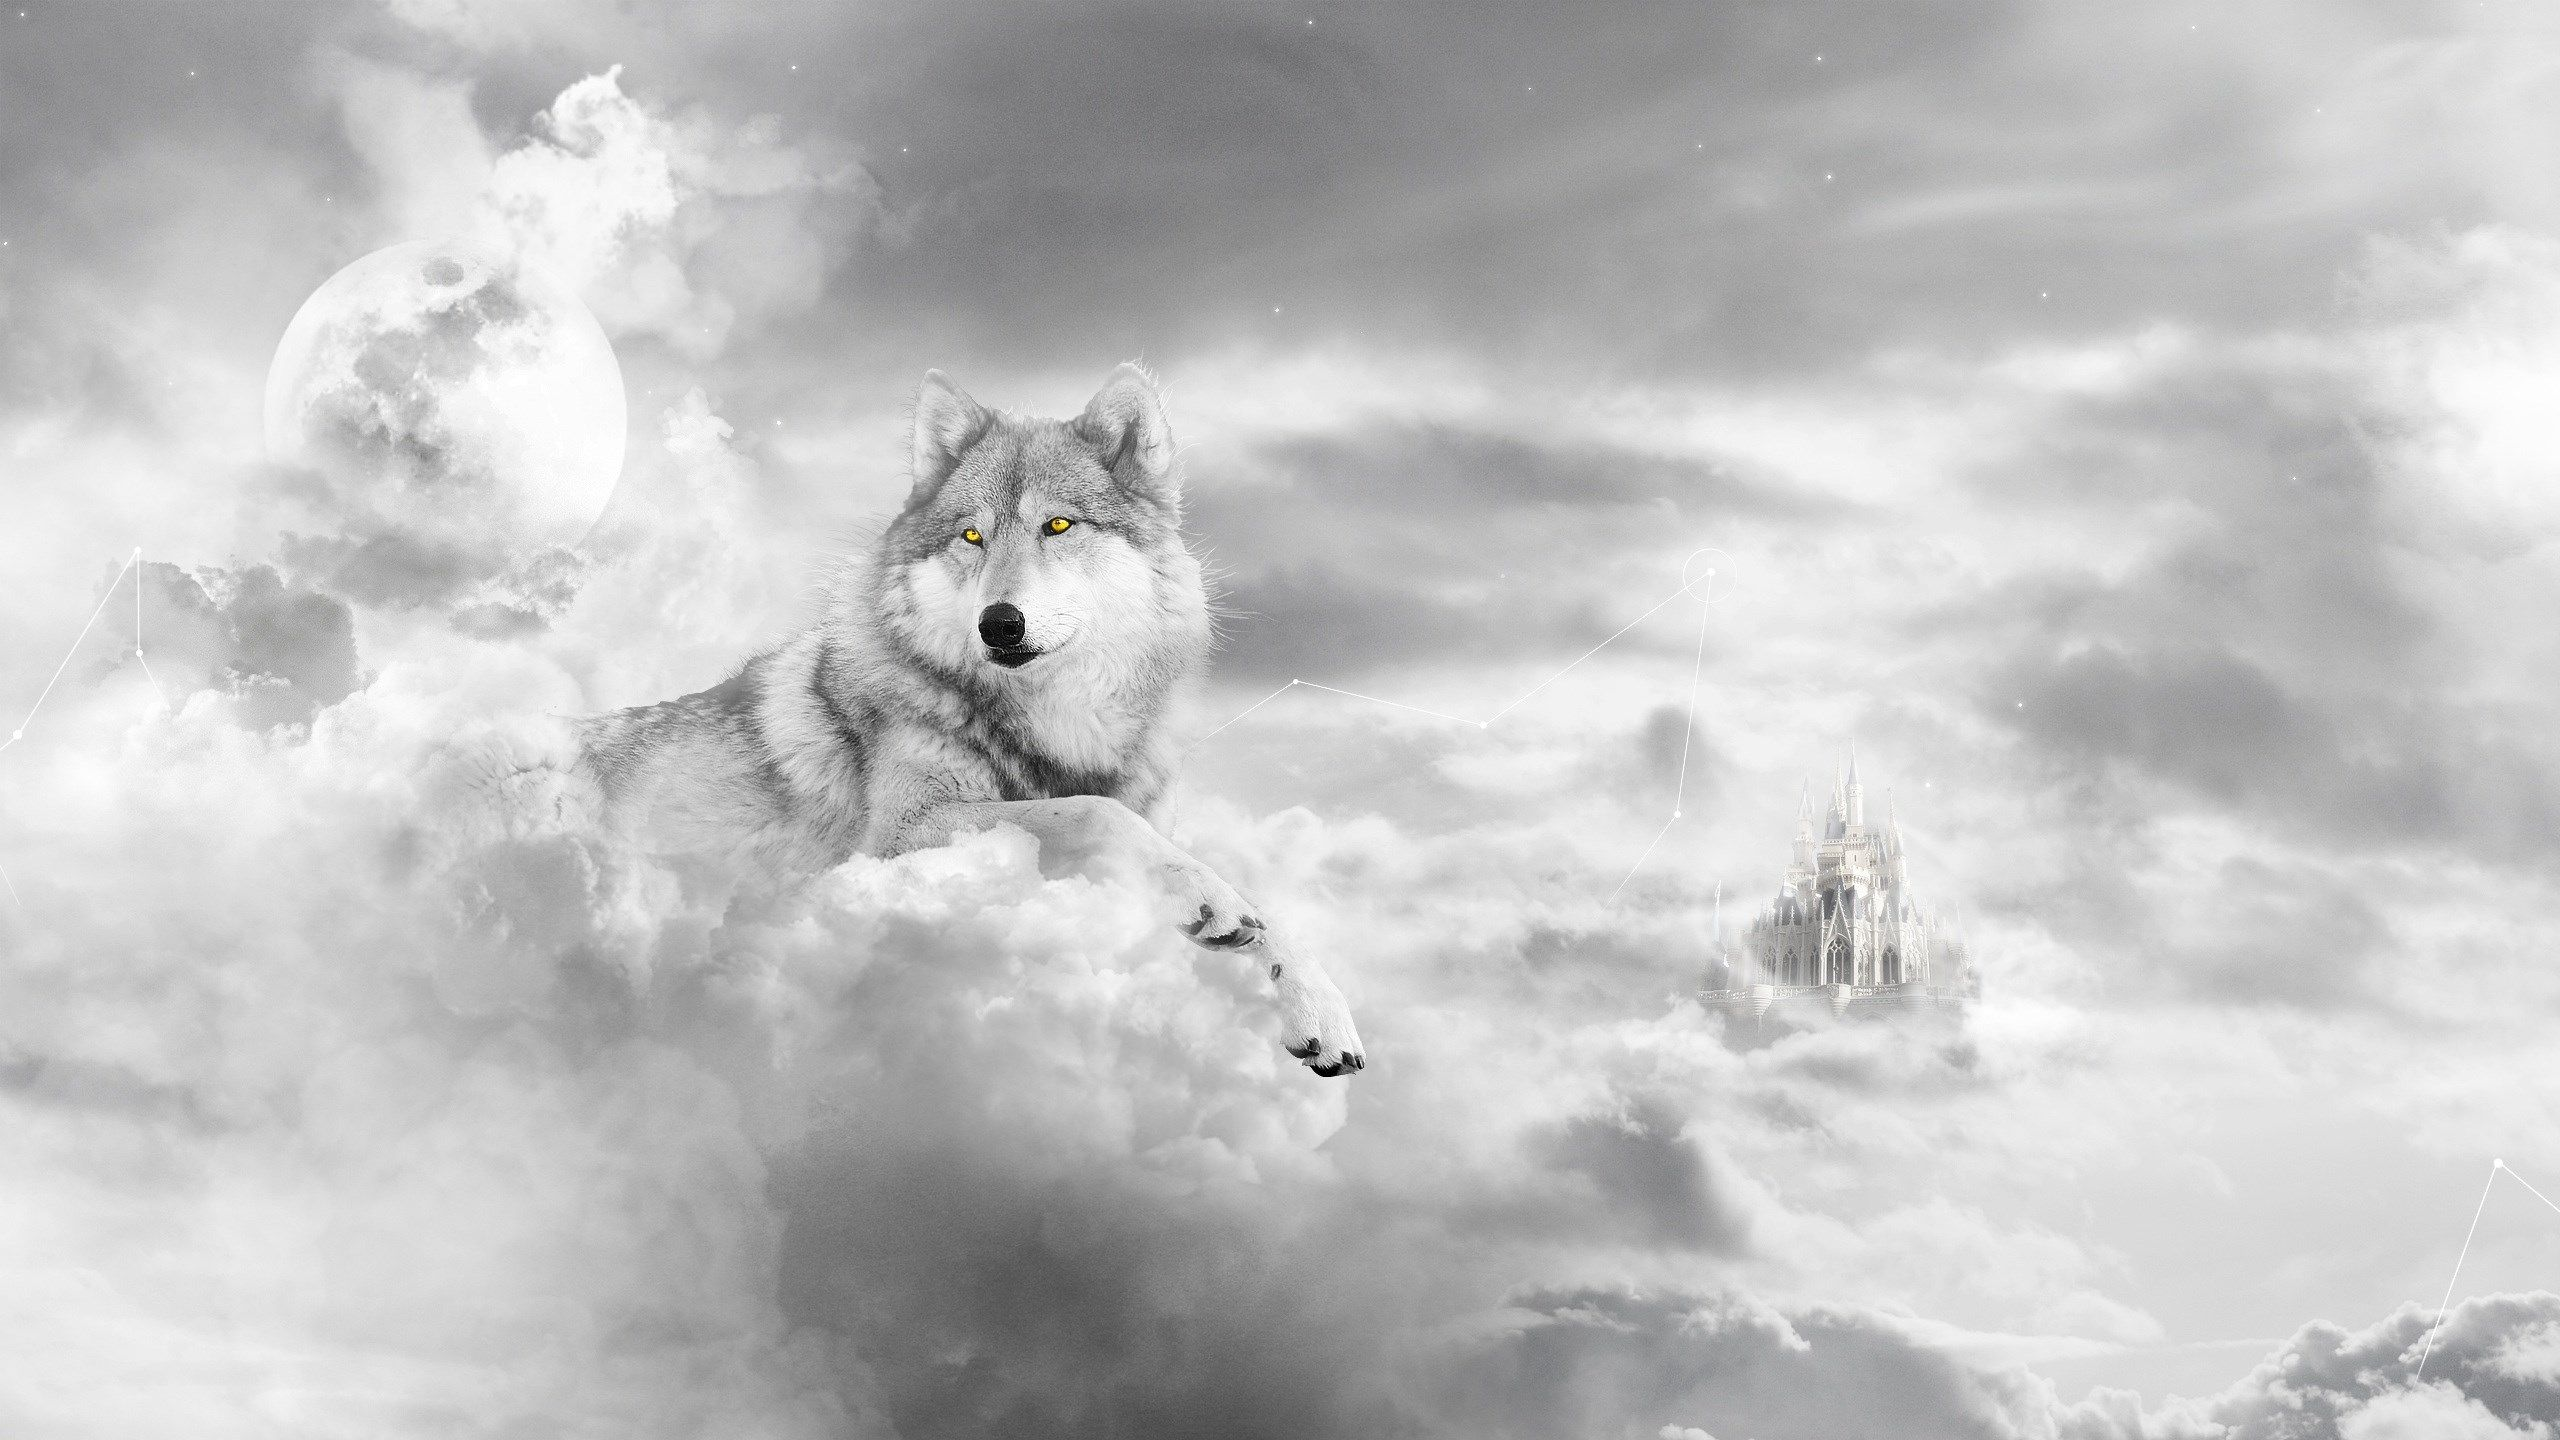 Wolf Wallpaper Widescreen Retina Imac By Wade Walls 2017 03 22